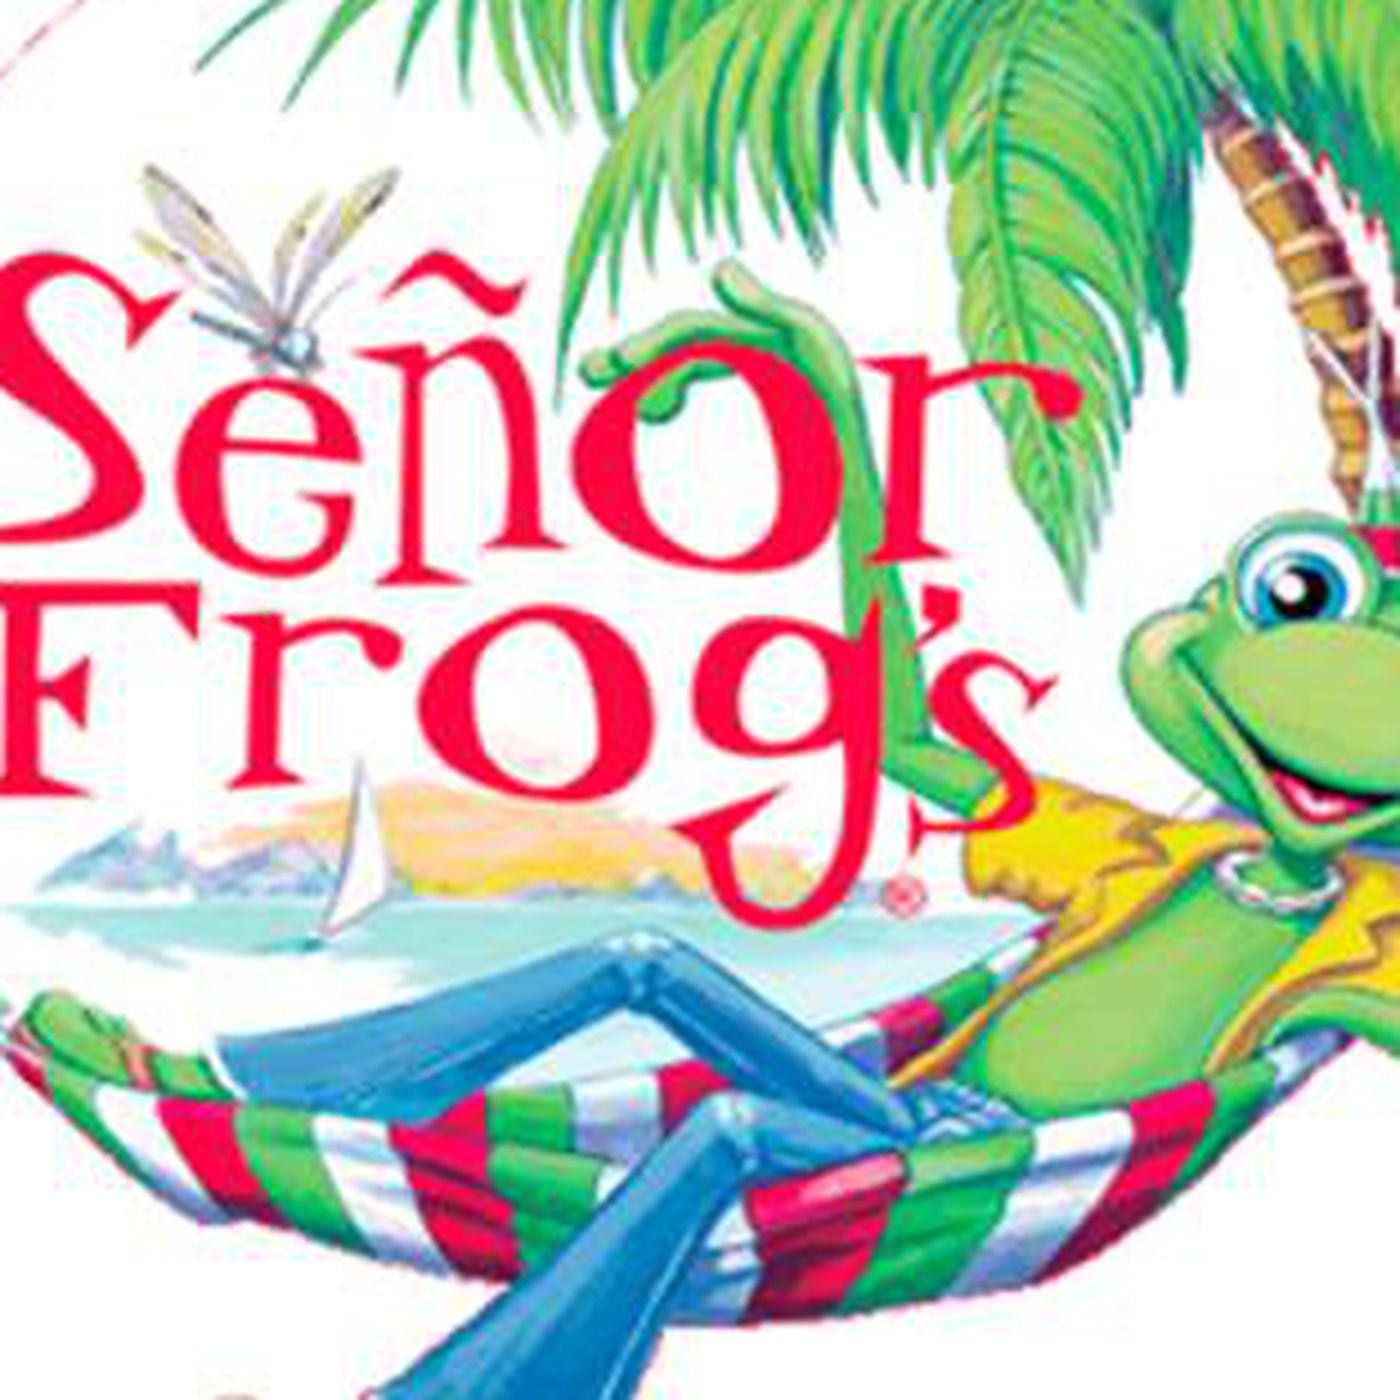 Se or frog s. Break clipart senor